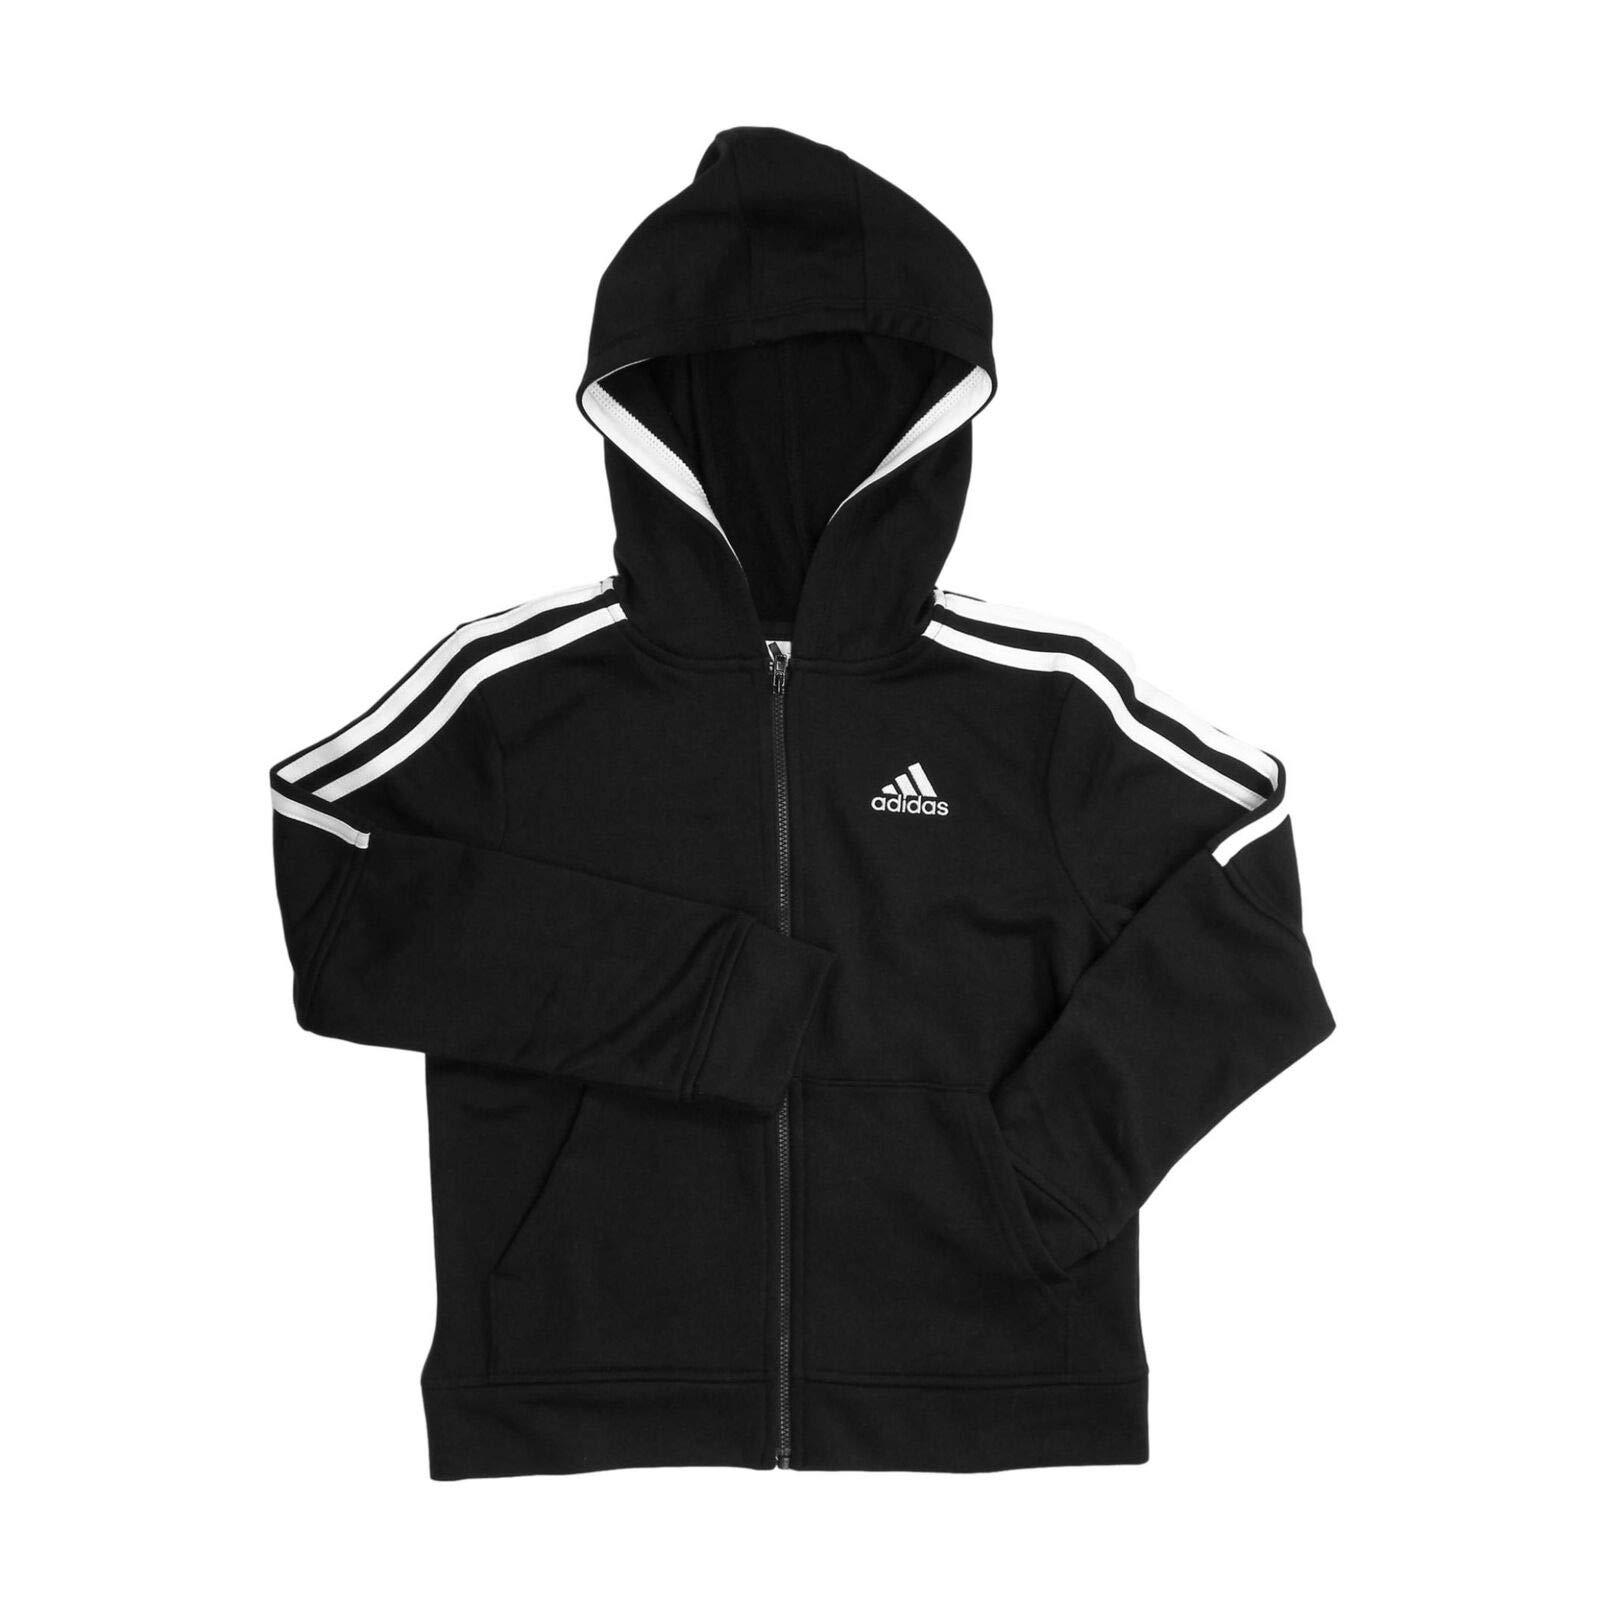 adidas Youth Boy's Full-Zip Three Stripe Hoodie,JC Black, S